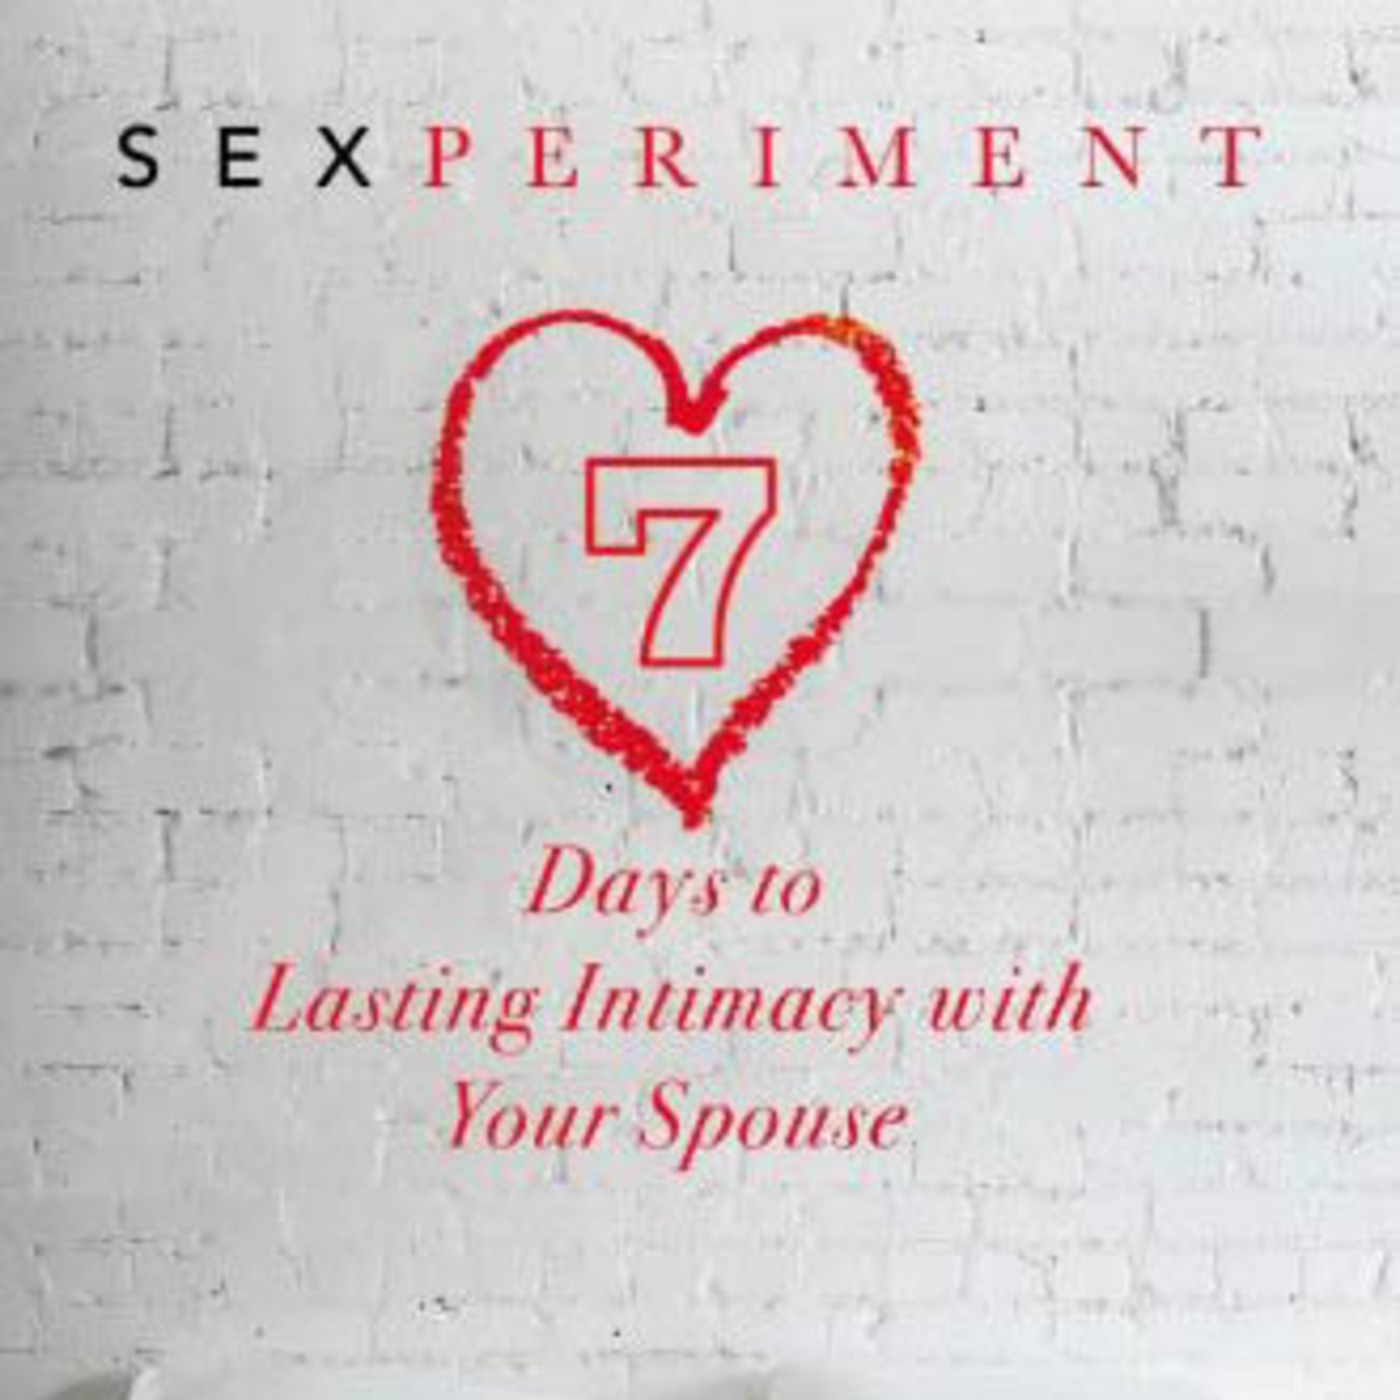 Sexperiment - Part 2 Inspiration Church podcast